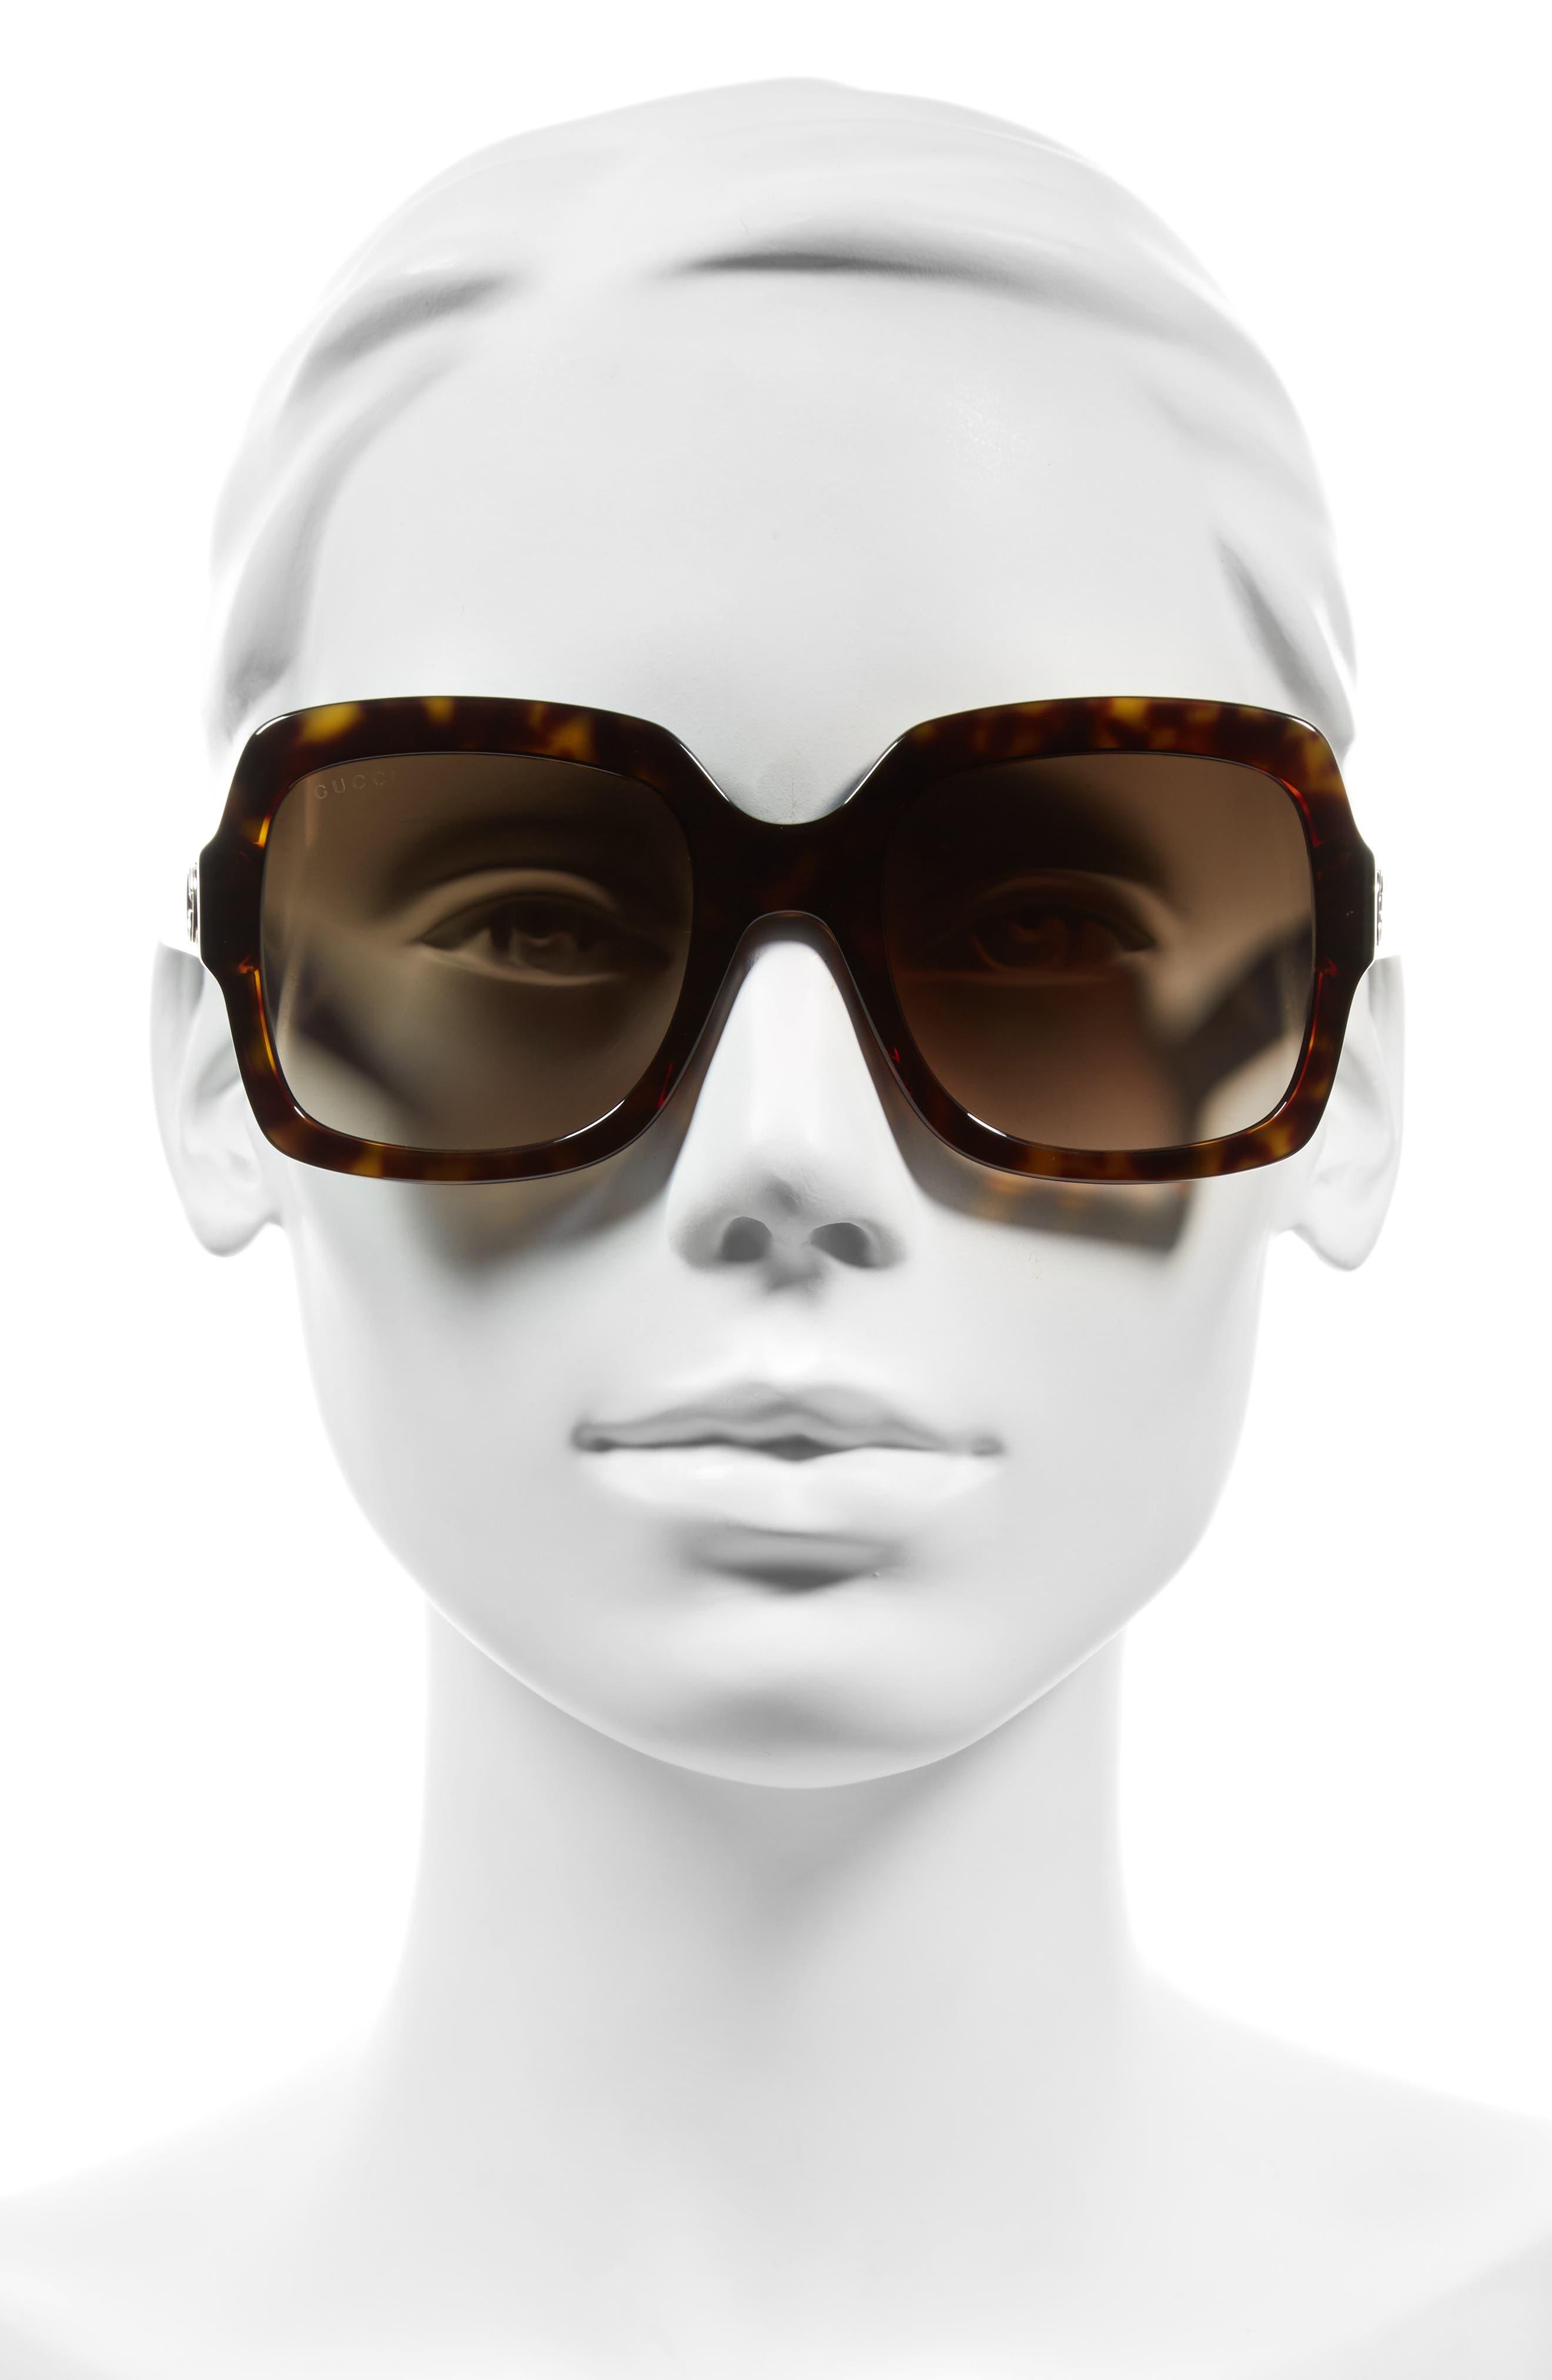 GUCCI,                             54mm Square Sunglasses,                             Alternate thumbnail 2, color,                             200